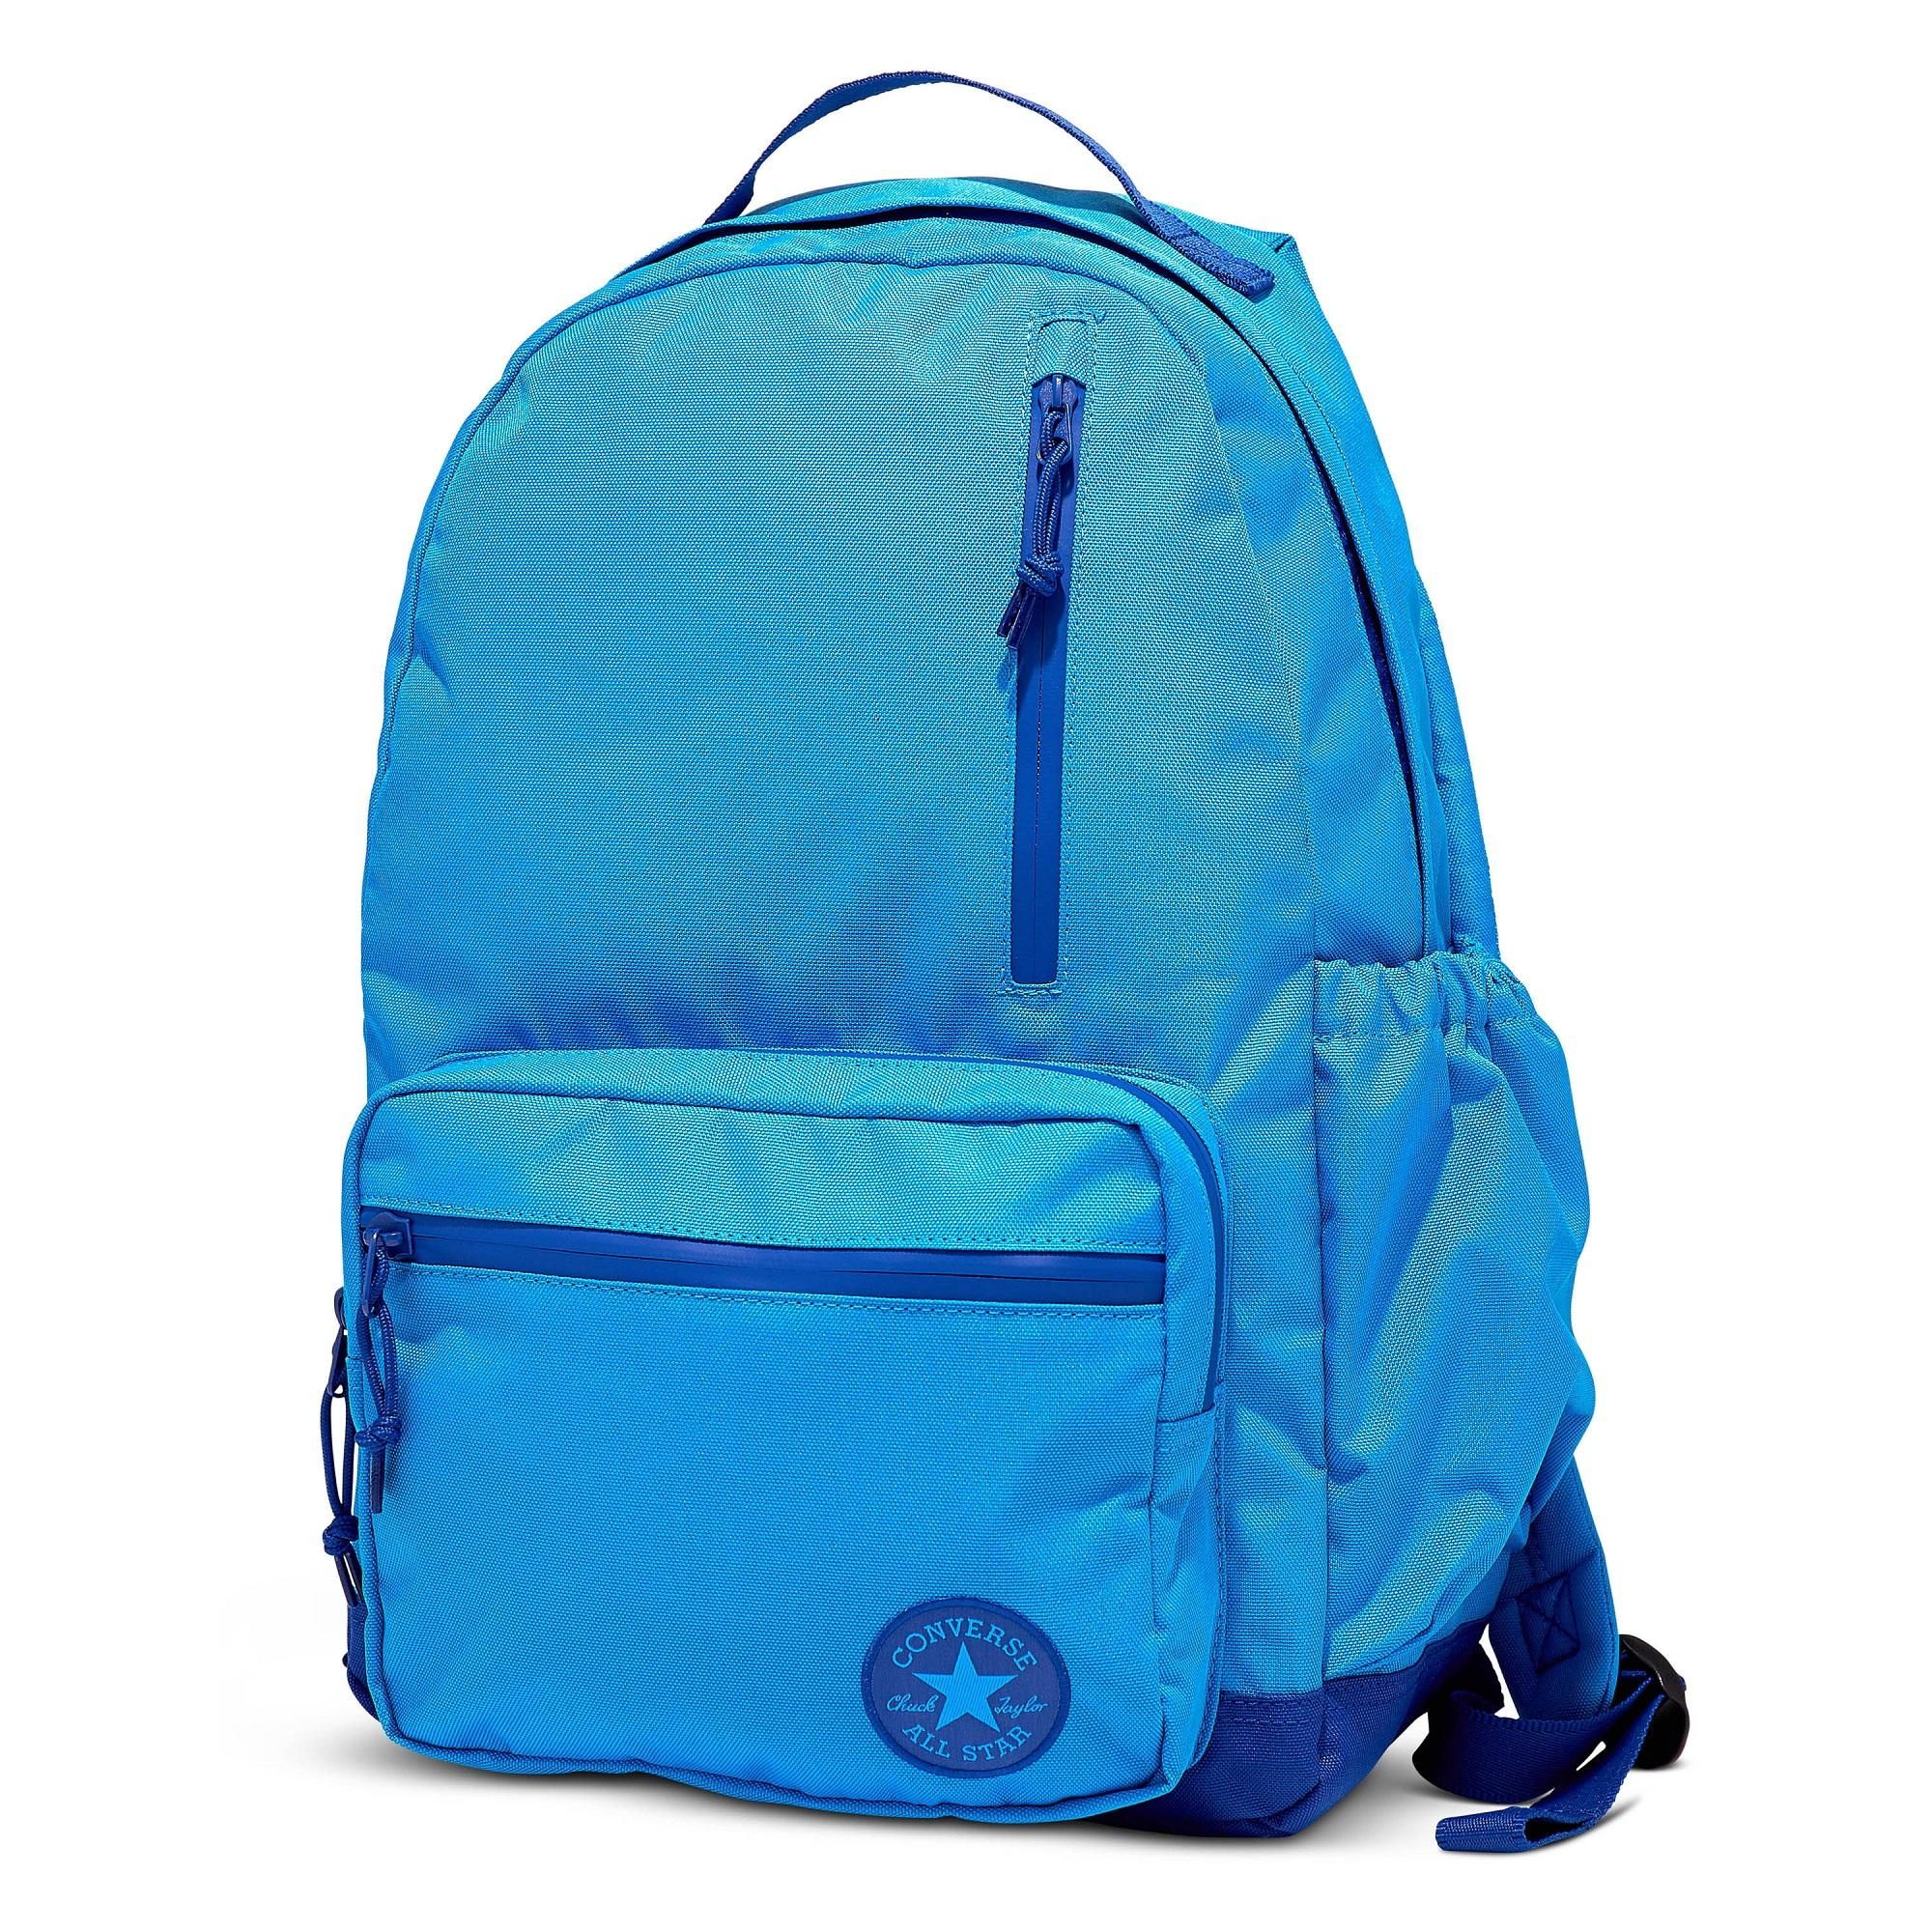 58faa14490 CONVERSE GO BACKPACK - BLUE HERO CONVERSE BLUE - 956448 - 10006930-A05